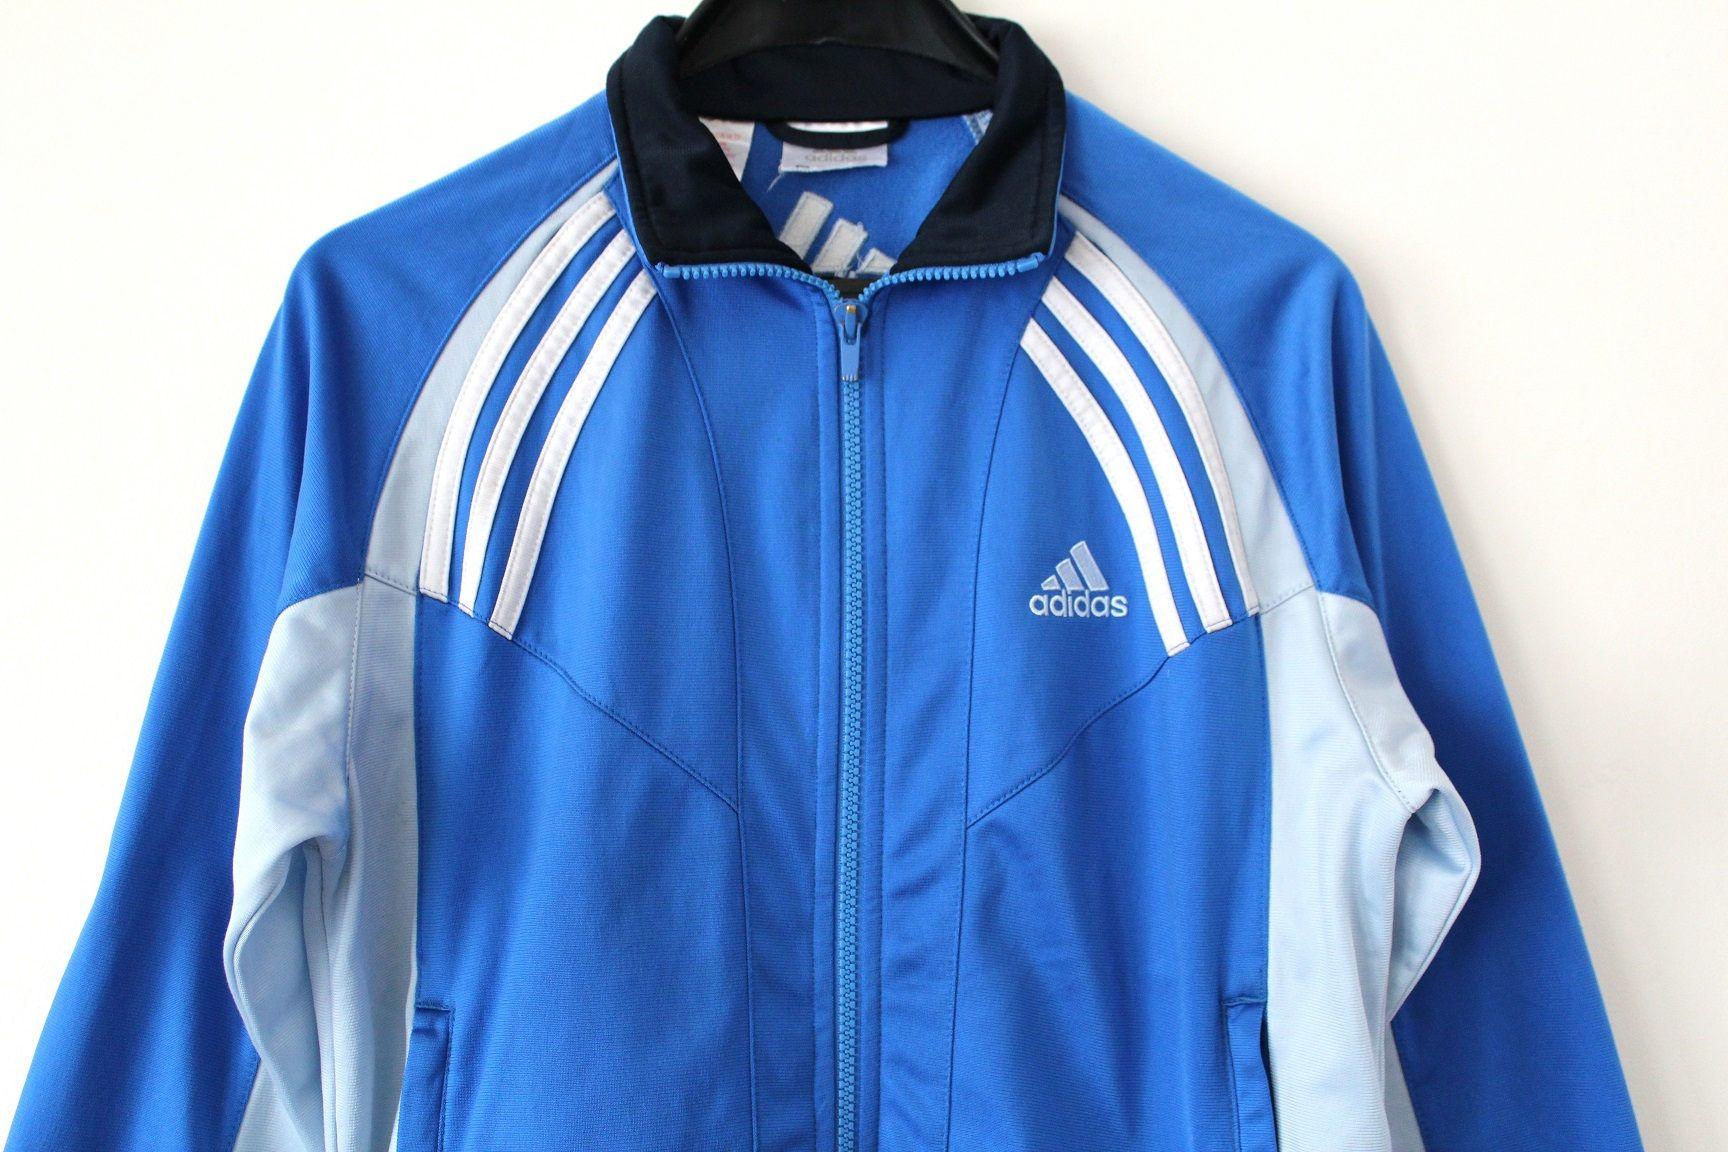 Black Green Adidas Sweatshirt, Vintage Adidas Jacket, Hip Hop Streetwear, Activewear, Tennis, Adidas Windbreaker, Sport Jacket